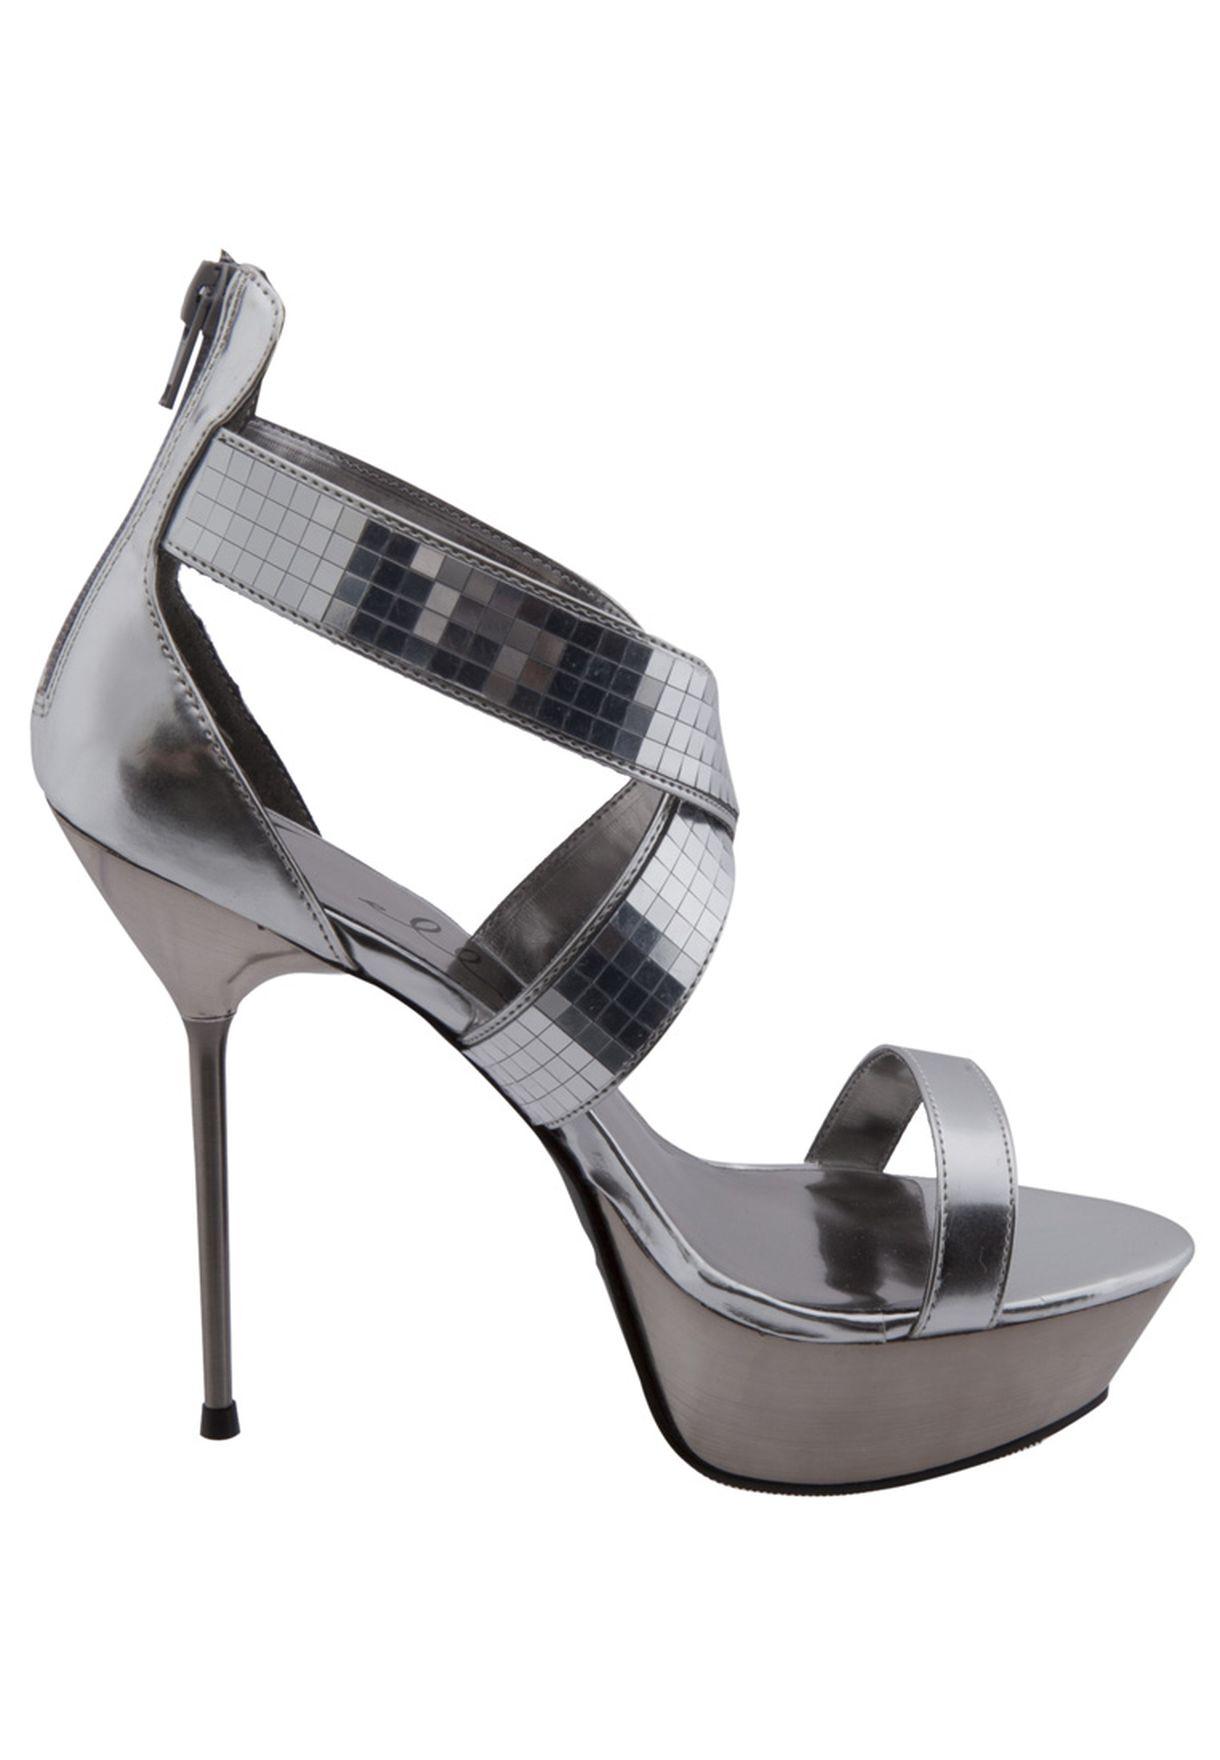 8161c9771 تسوق Embelished Sandals ماركة الي شوز لون فضي في عمان - EL769SH56YIL